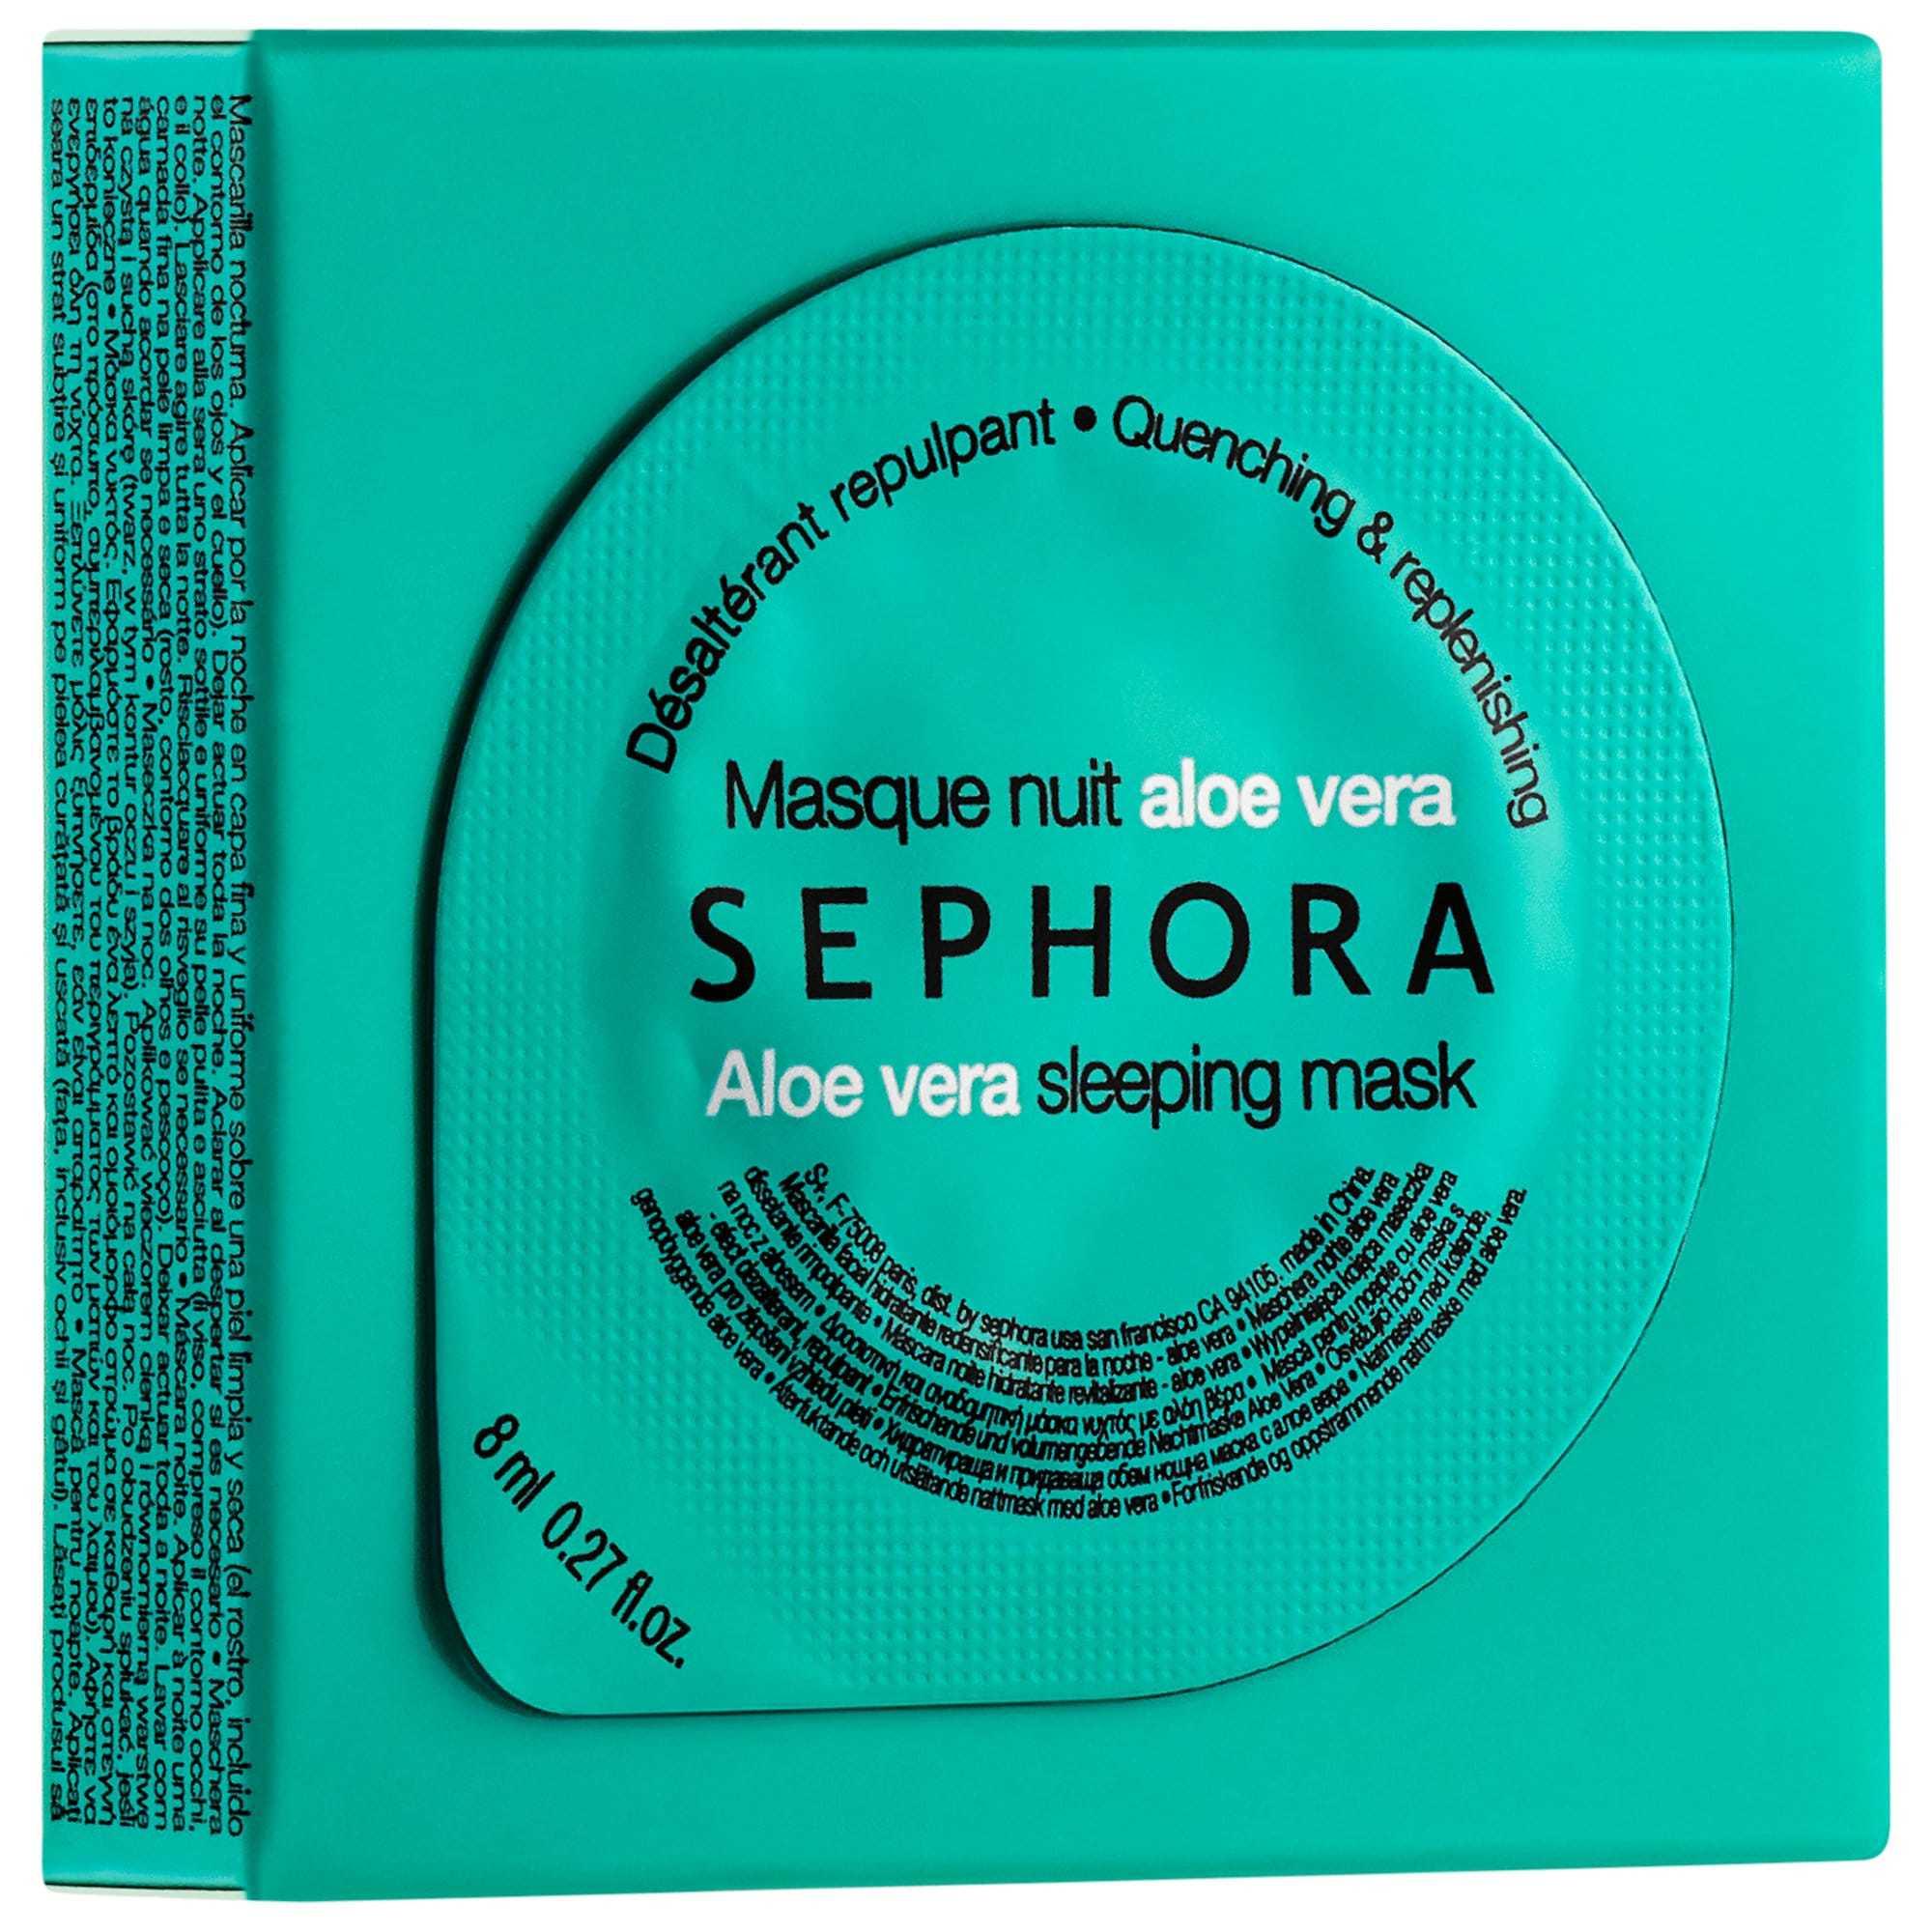 Sephora Aloe Vera Sleeping Mask